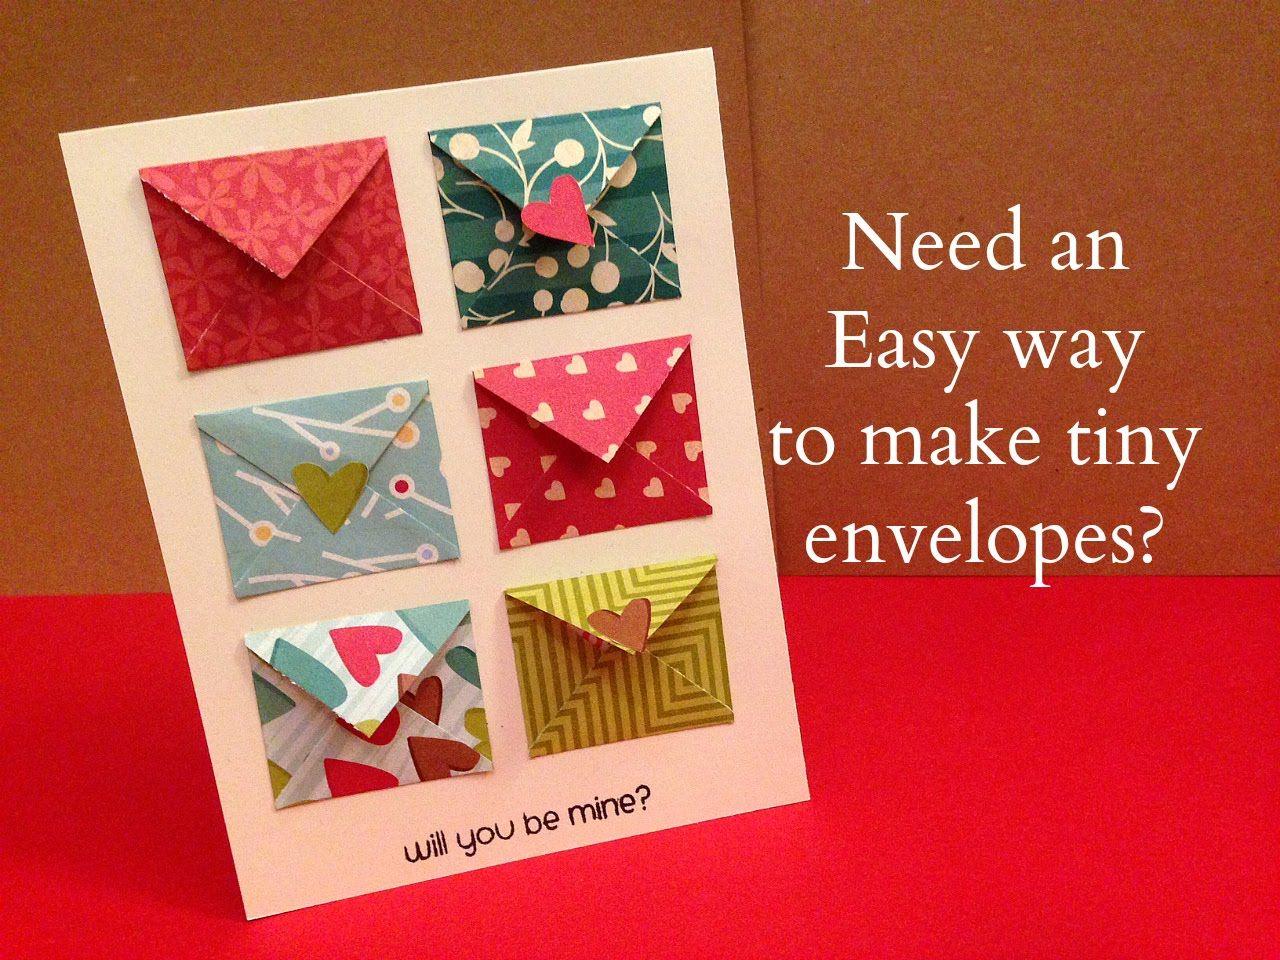 How to Make Tiny Envelope and a Card Tutorial Tiny